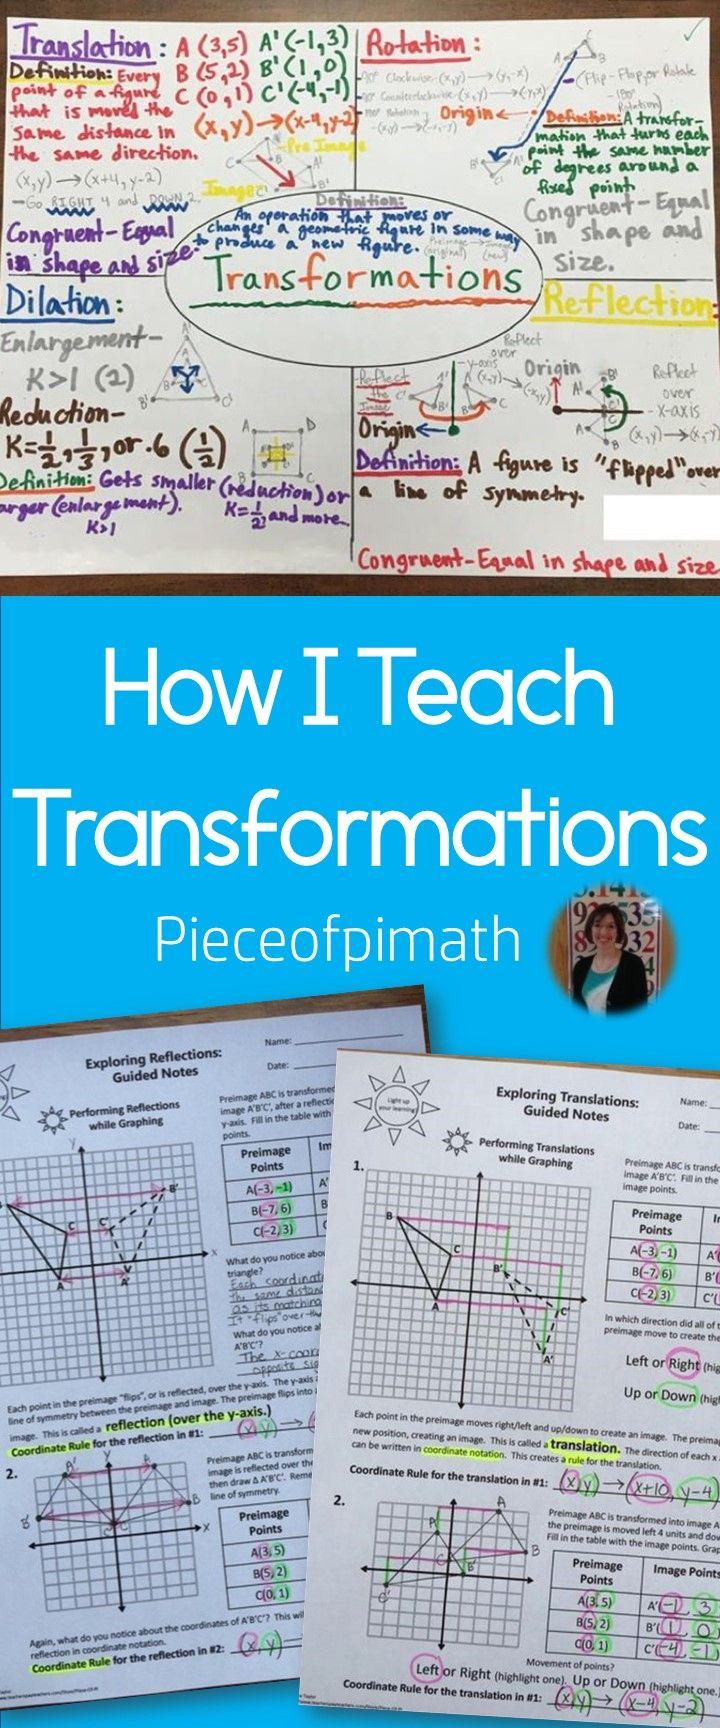 Classroom Ideas, hands-on activities. Pieceofpimath.com | school ...